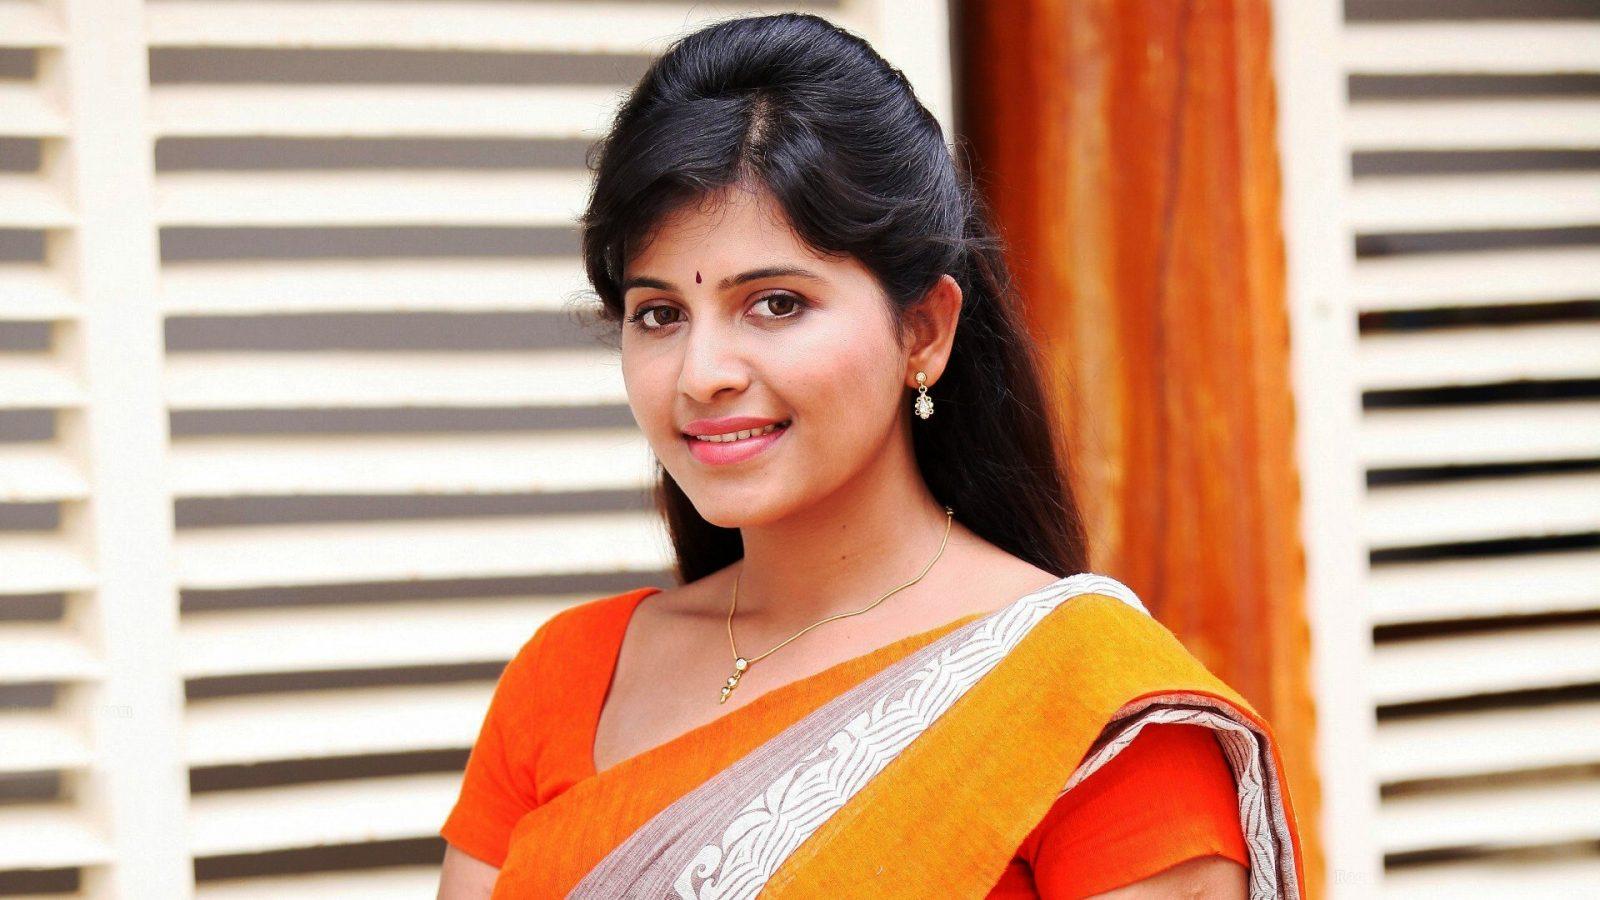 Tamil Actress Hd Wallpapers 1366x768 Best Hd Wallpaper